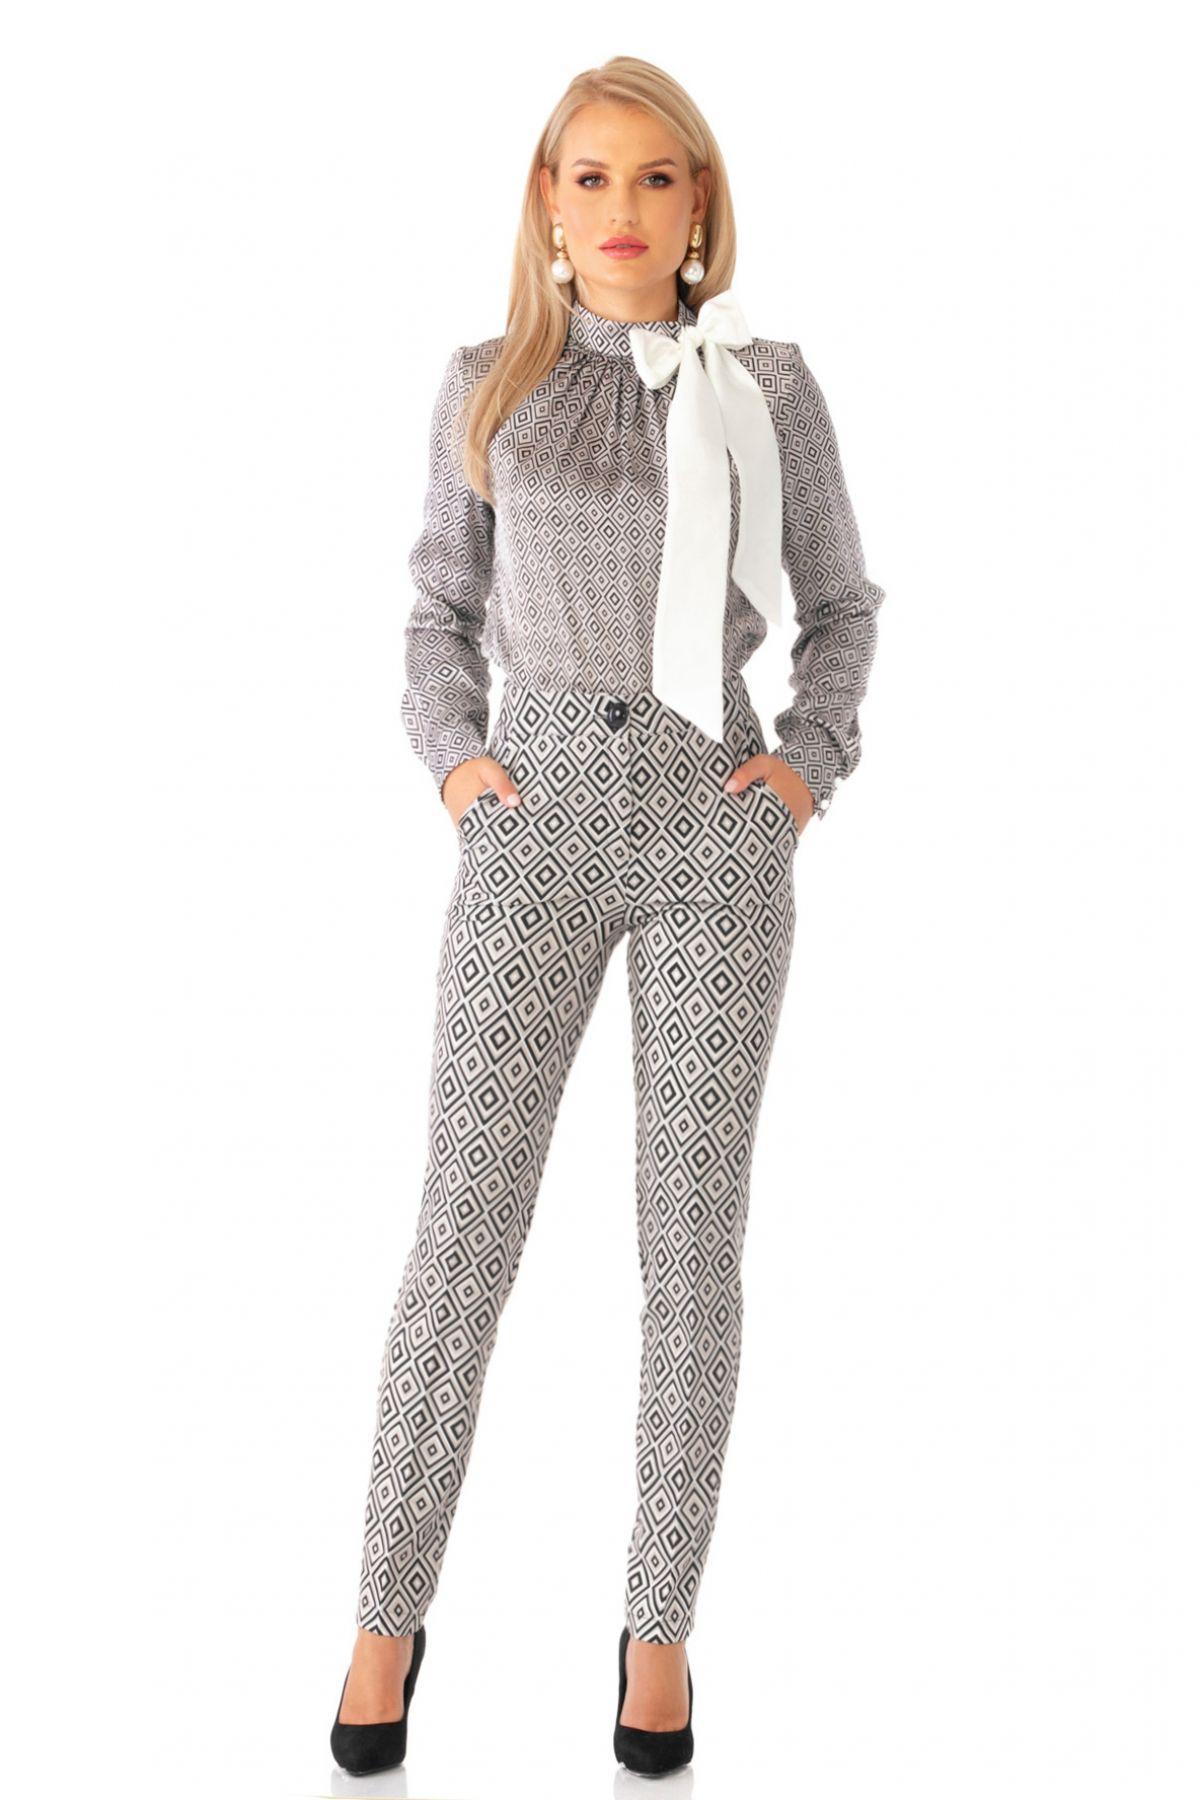 Pantaloni Pretty Girl gri cu print romburi